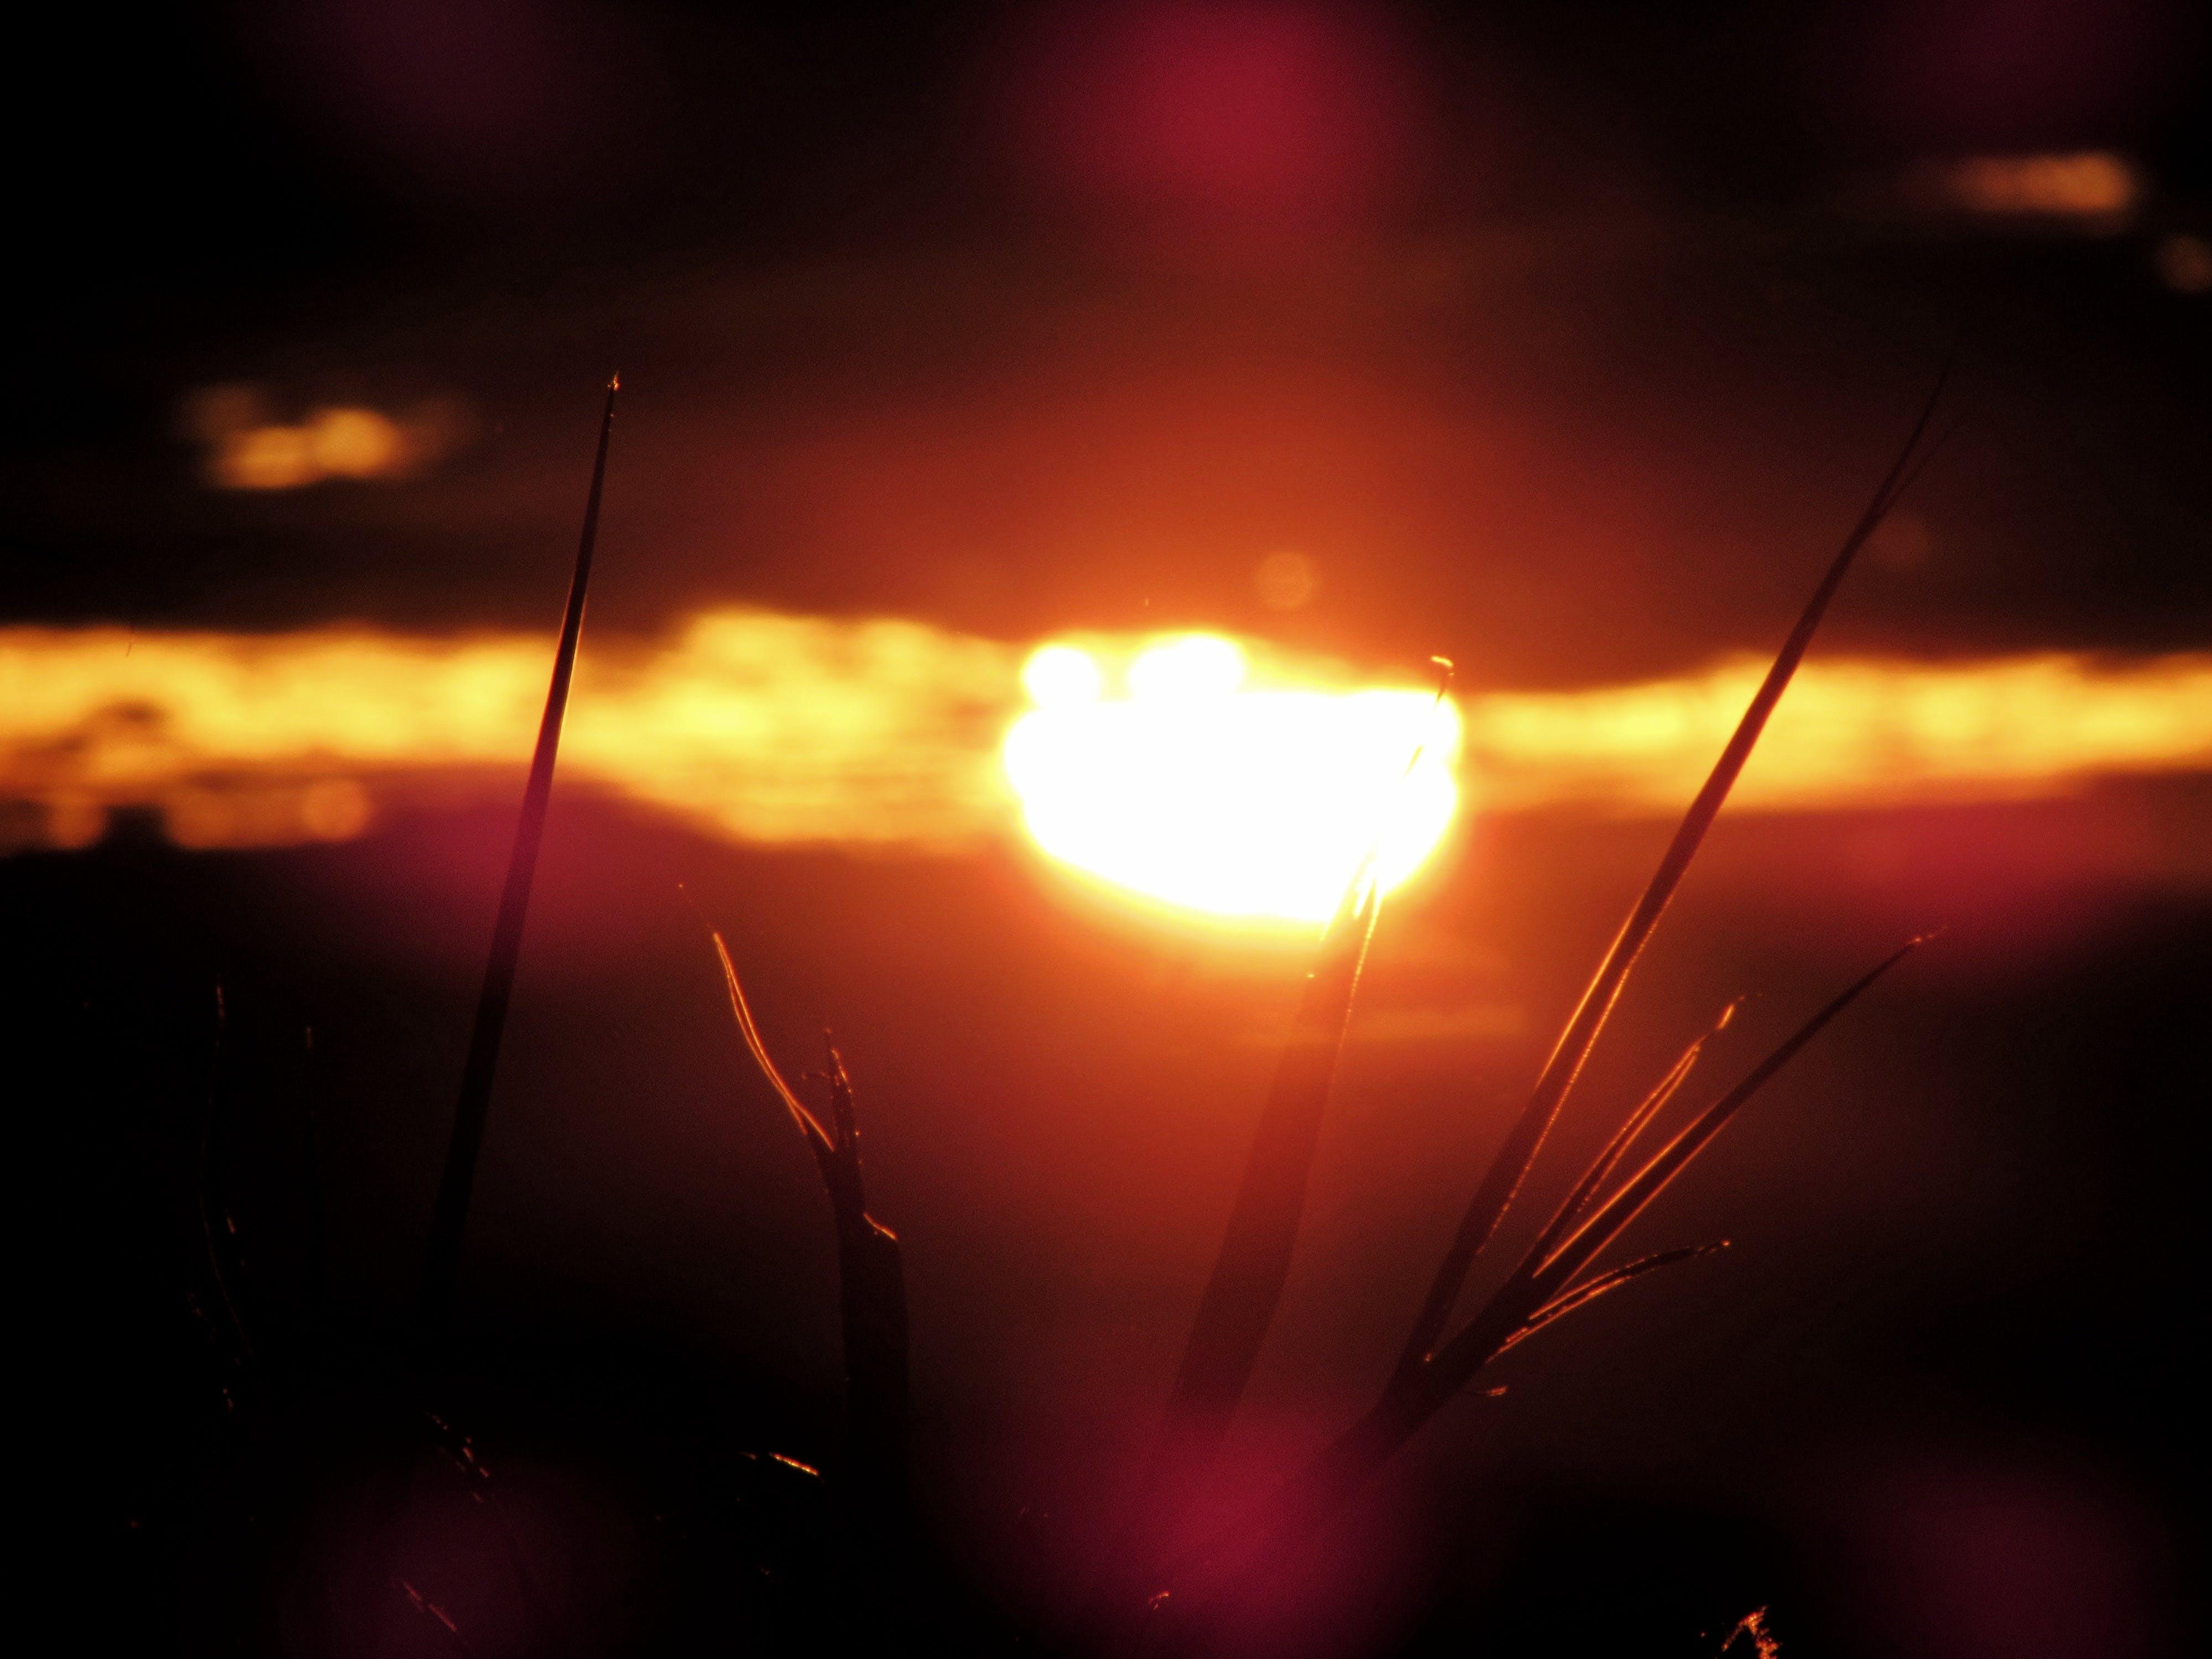 Free stock photo of Burning sky, golden sky, sunrise